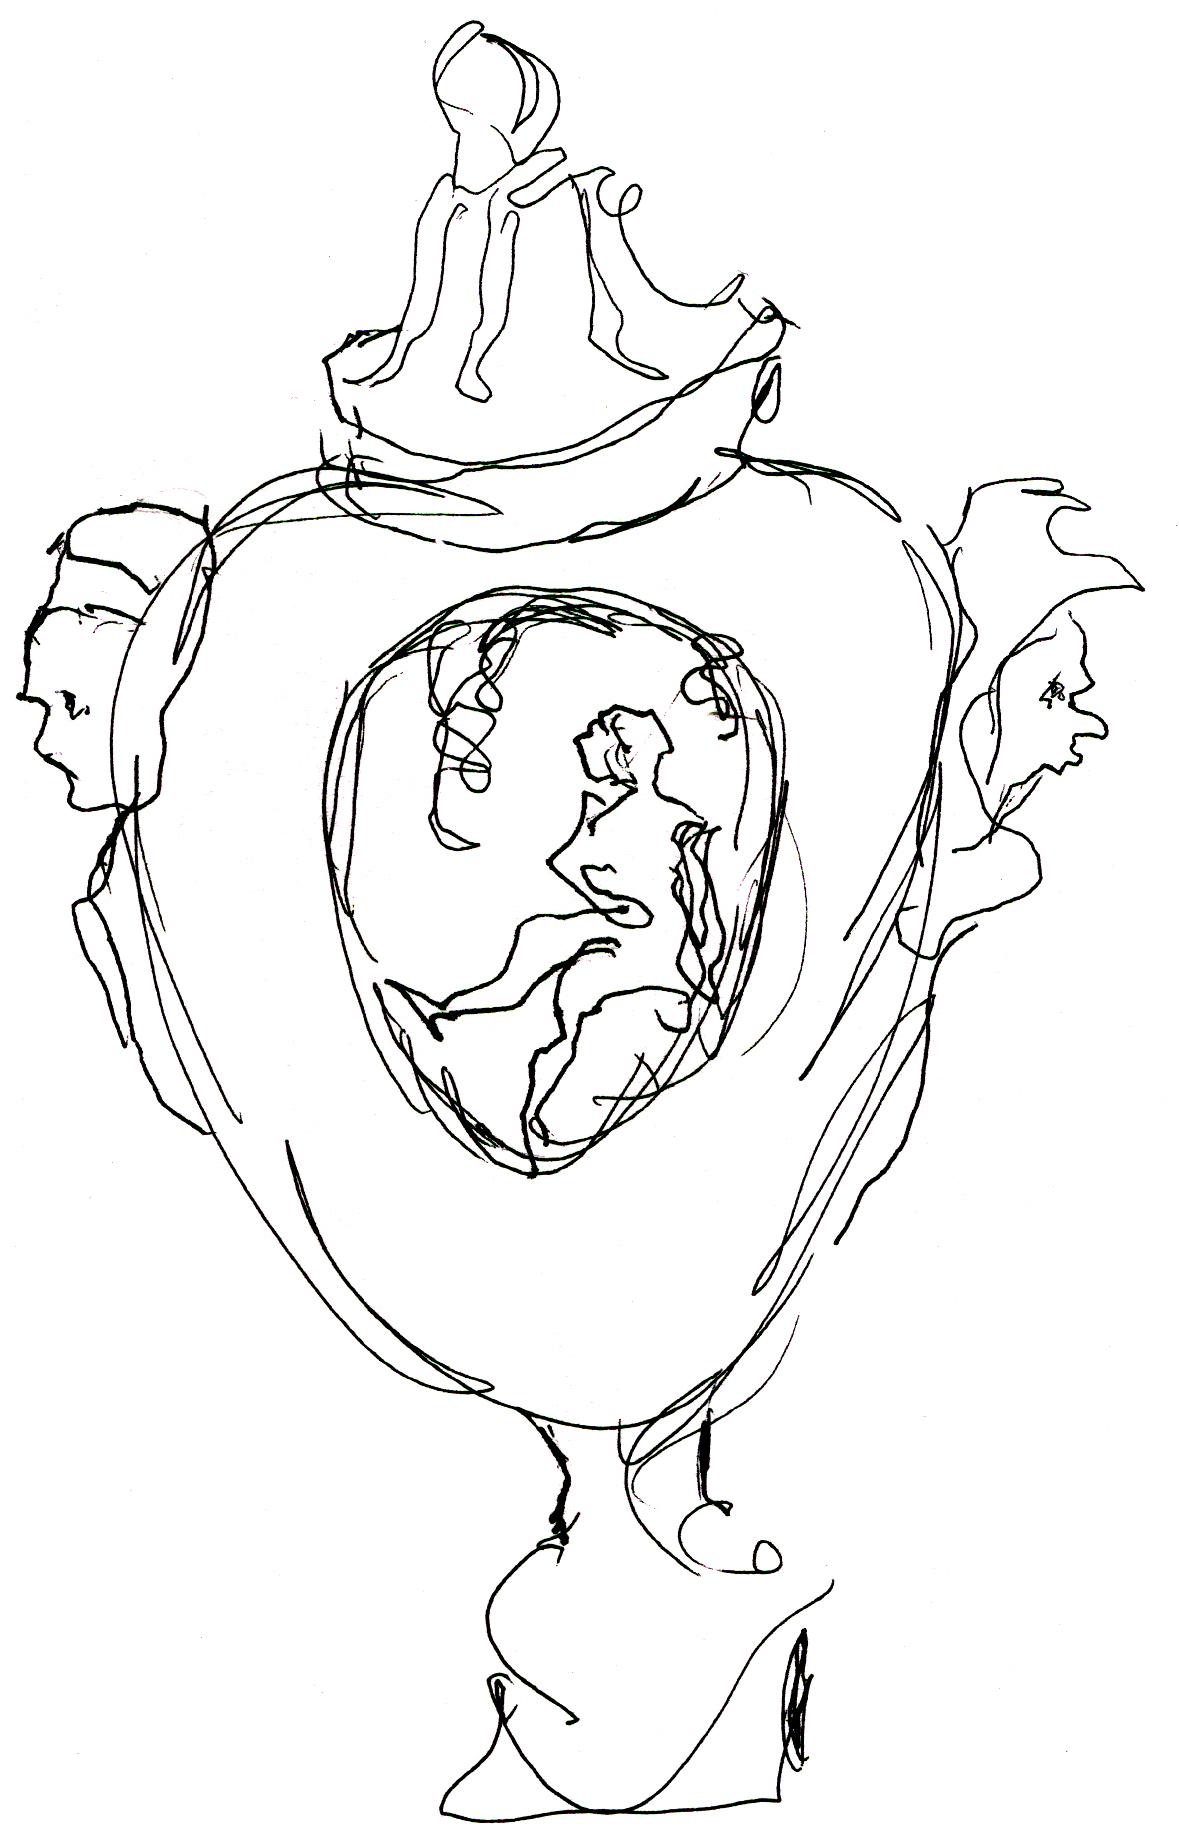 Drawing. Vase